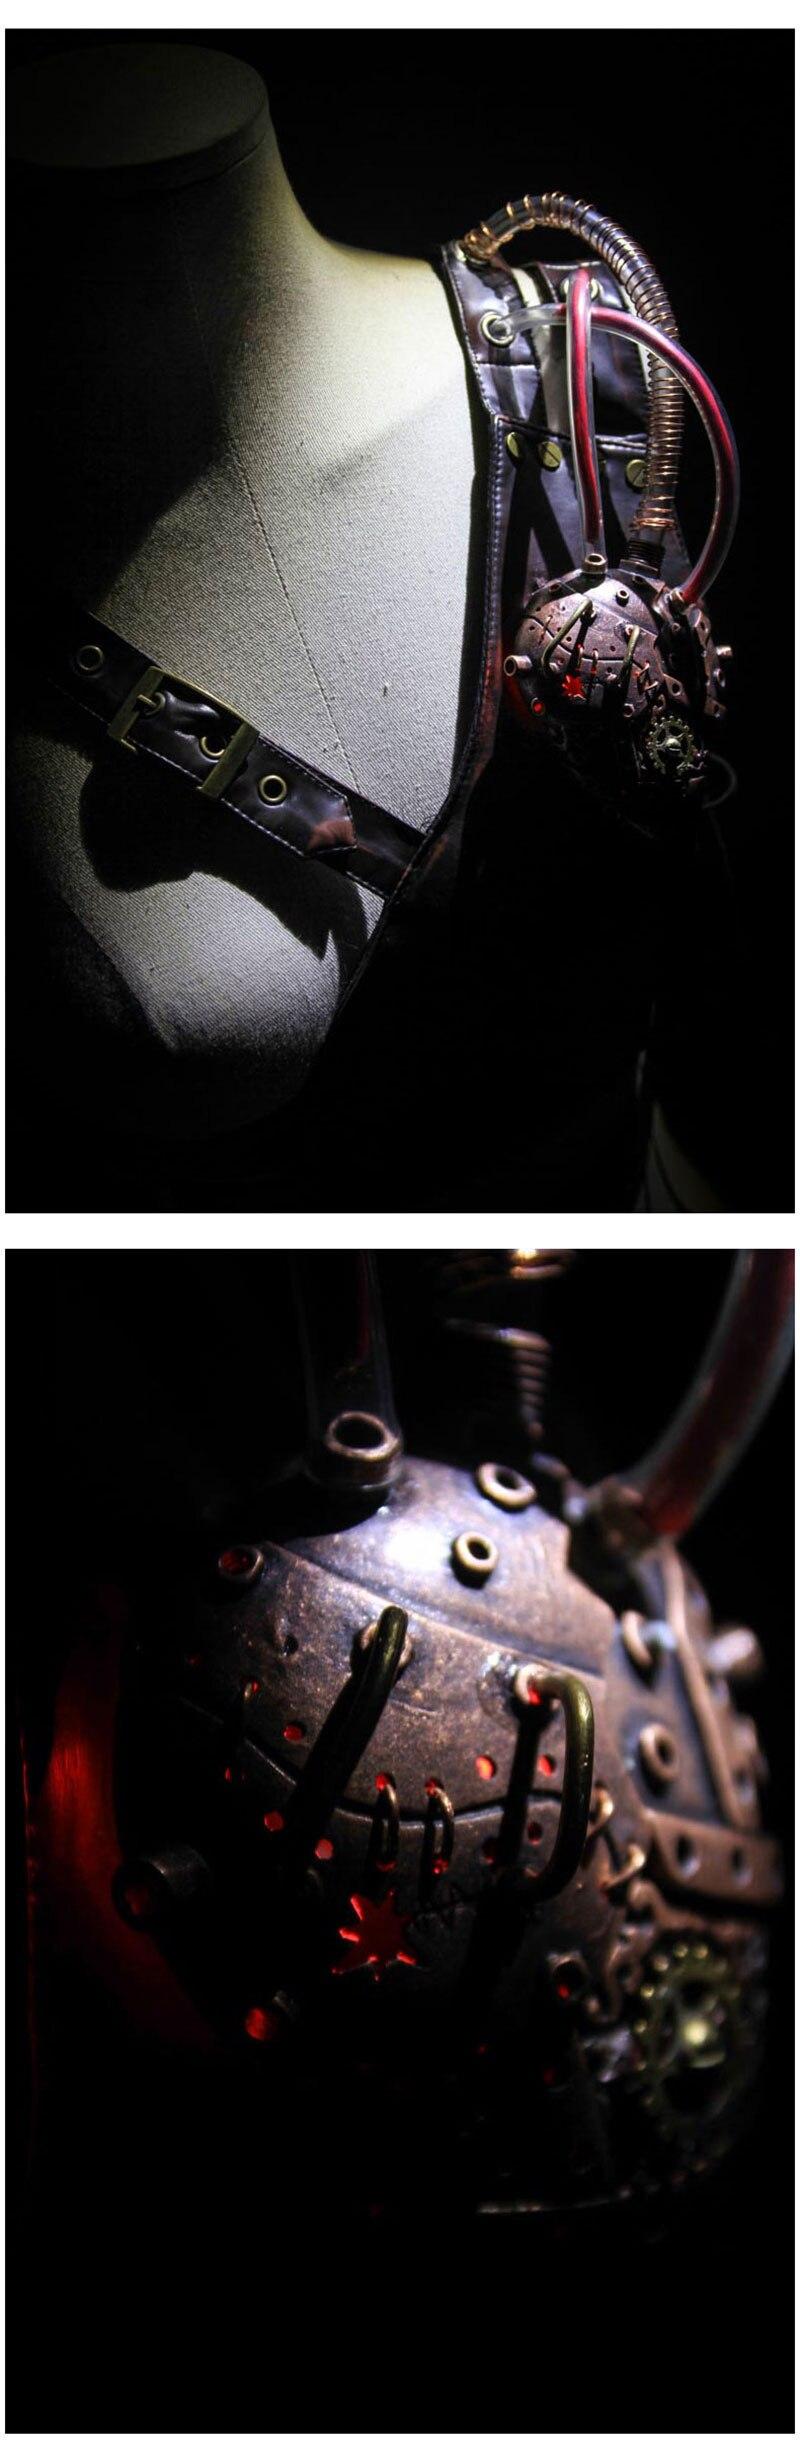 Retro Bronze/black Metallics Rubber Steampunk Pipeline Gas Mask Gothic Punk Game Women/men Halloween Cosplay Costume Accessories Good Taste Costumes & Accessories Boys Costume Accessories